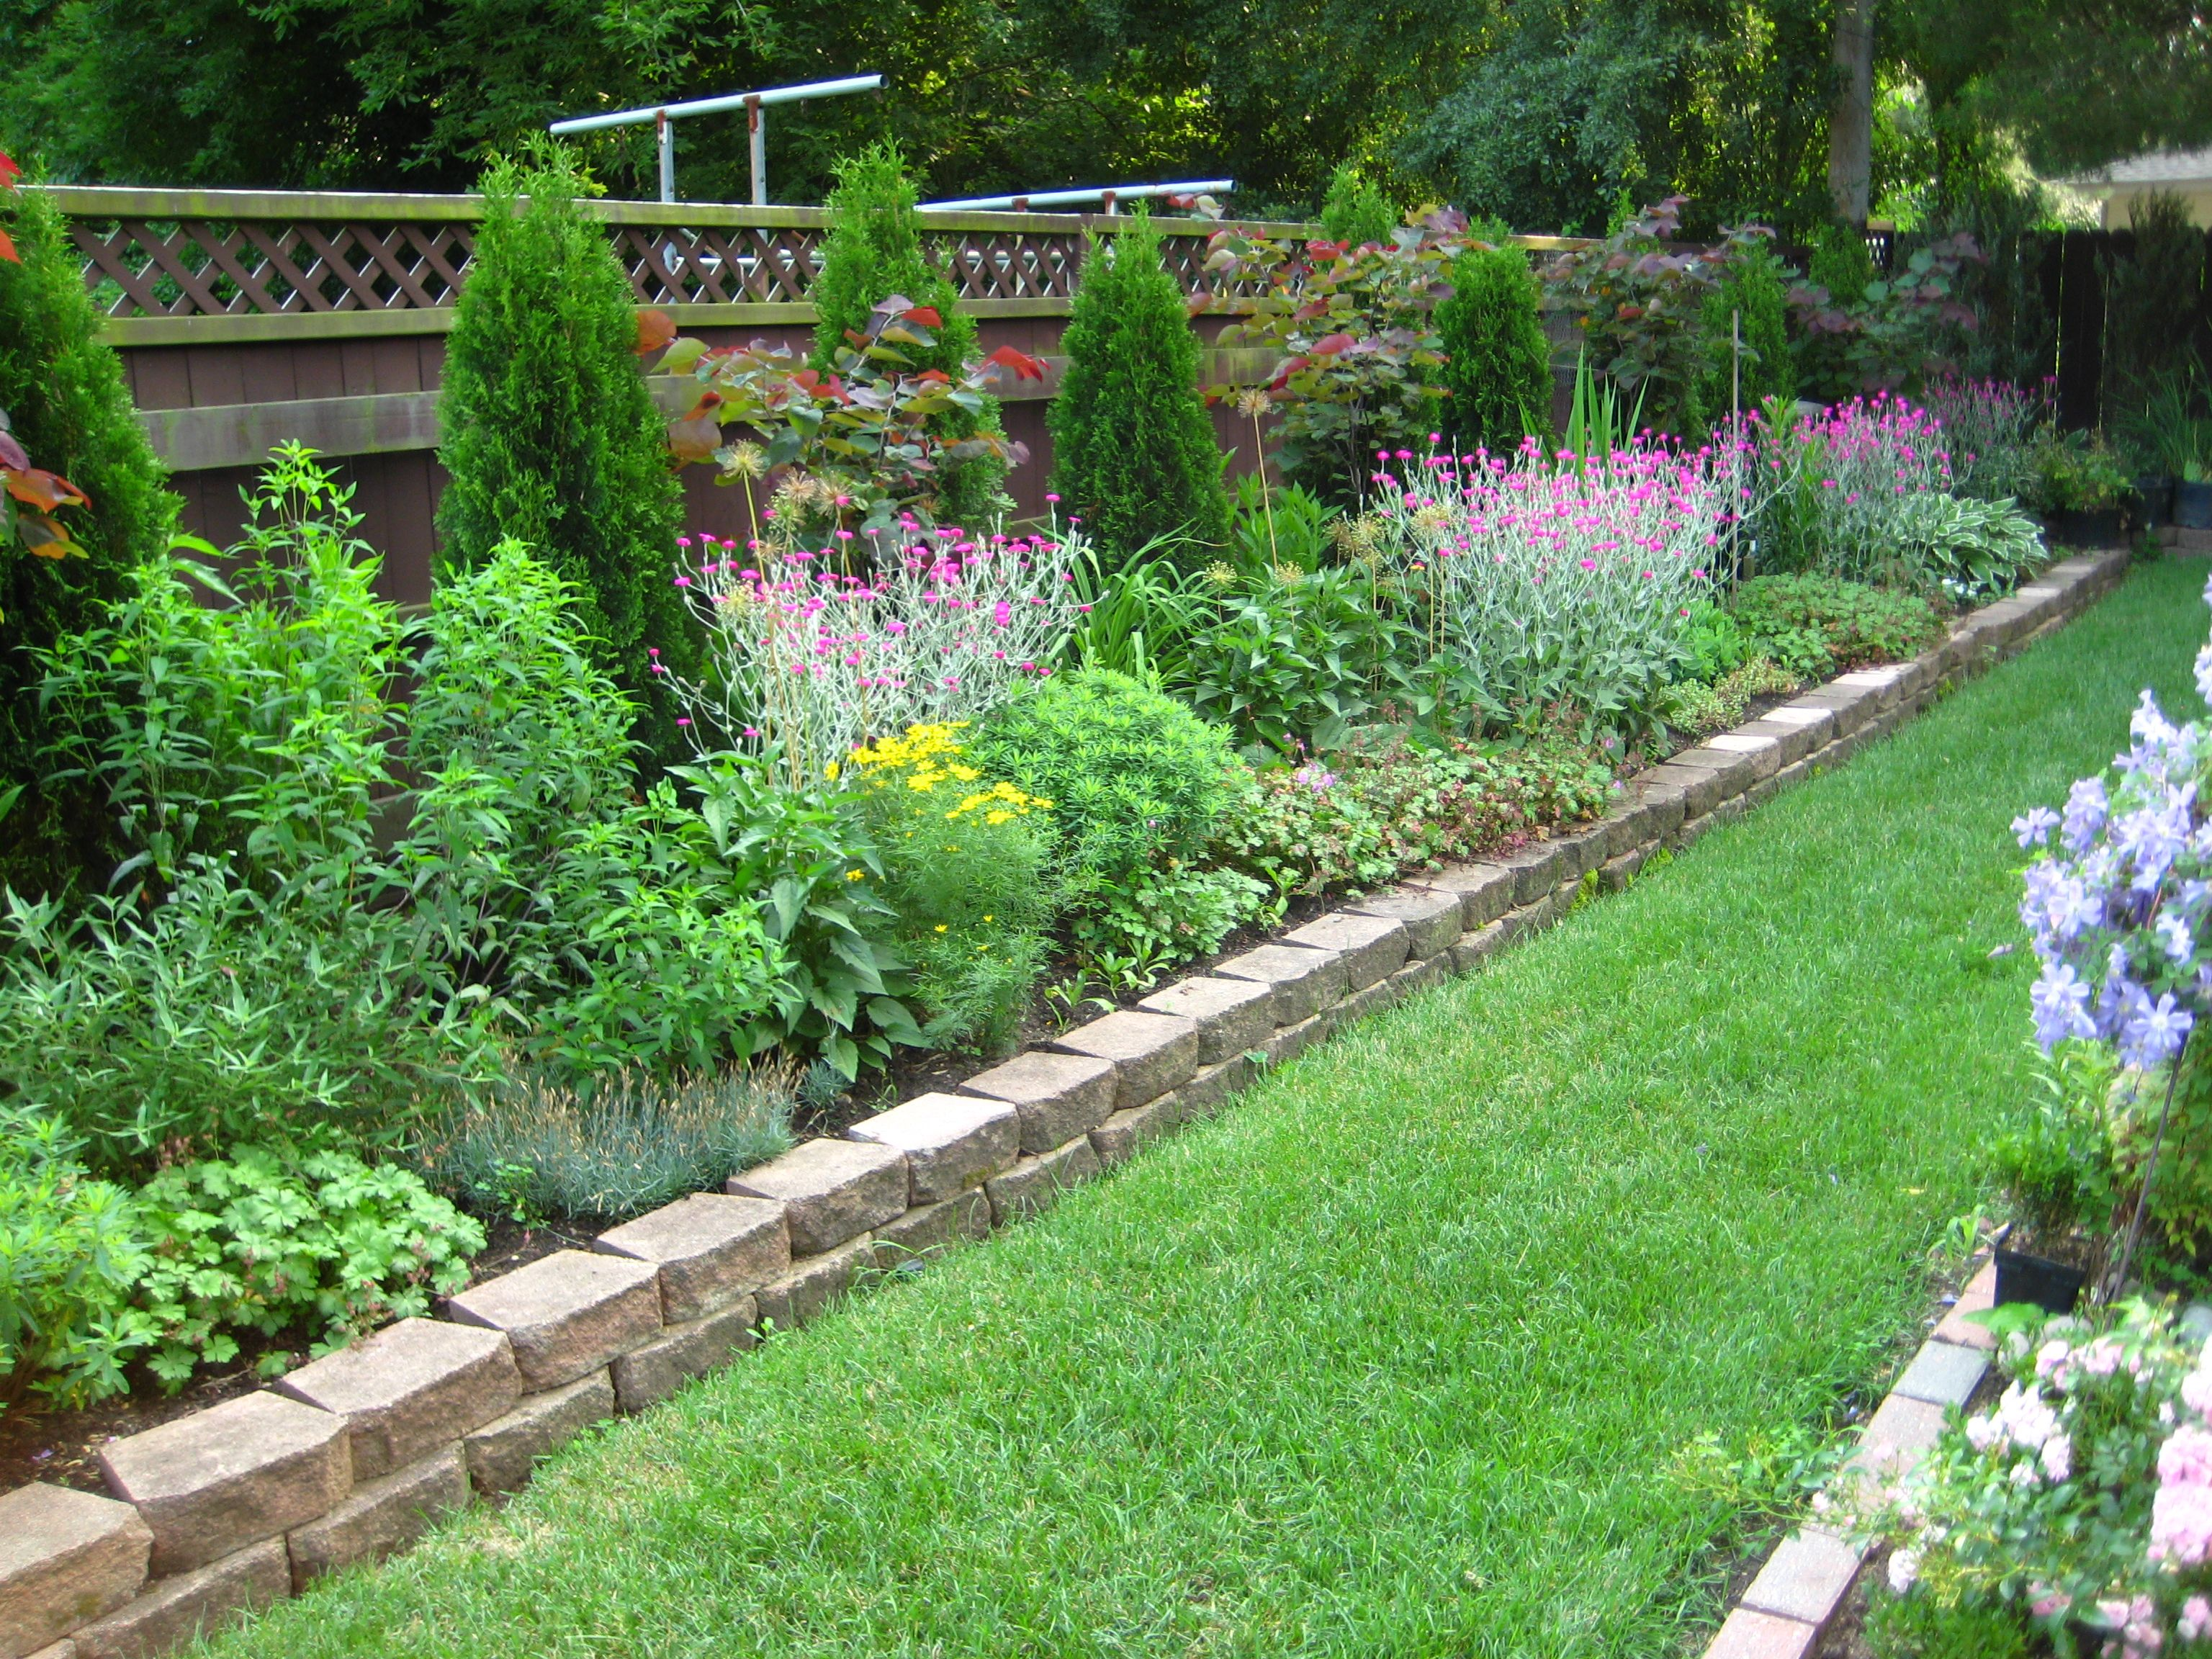 Pin By Kelli Gandy On Kellioutdoorgarden Pinterest Garden Design